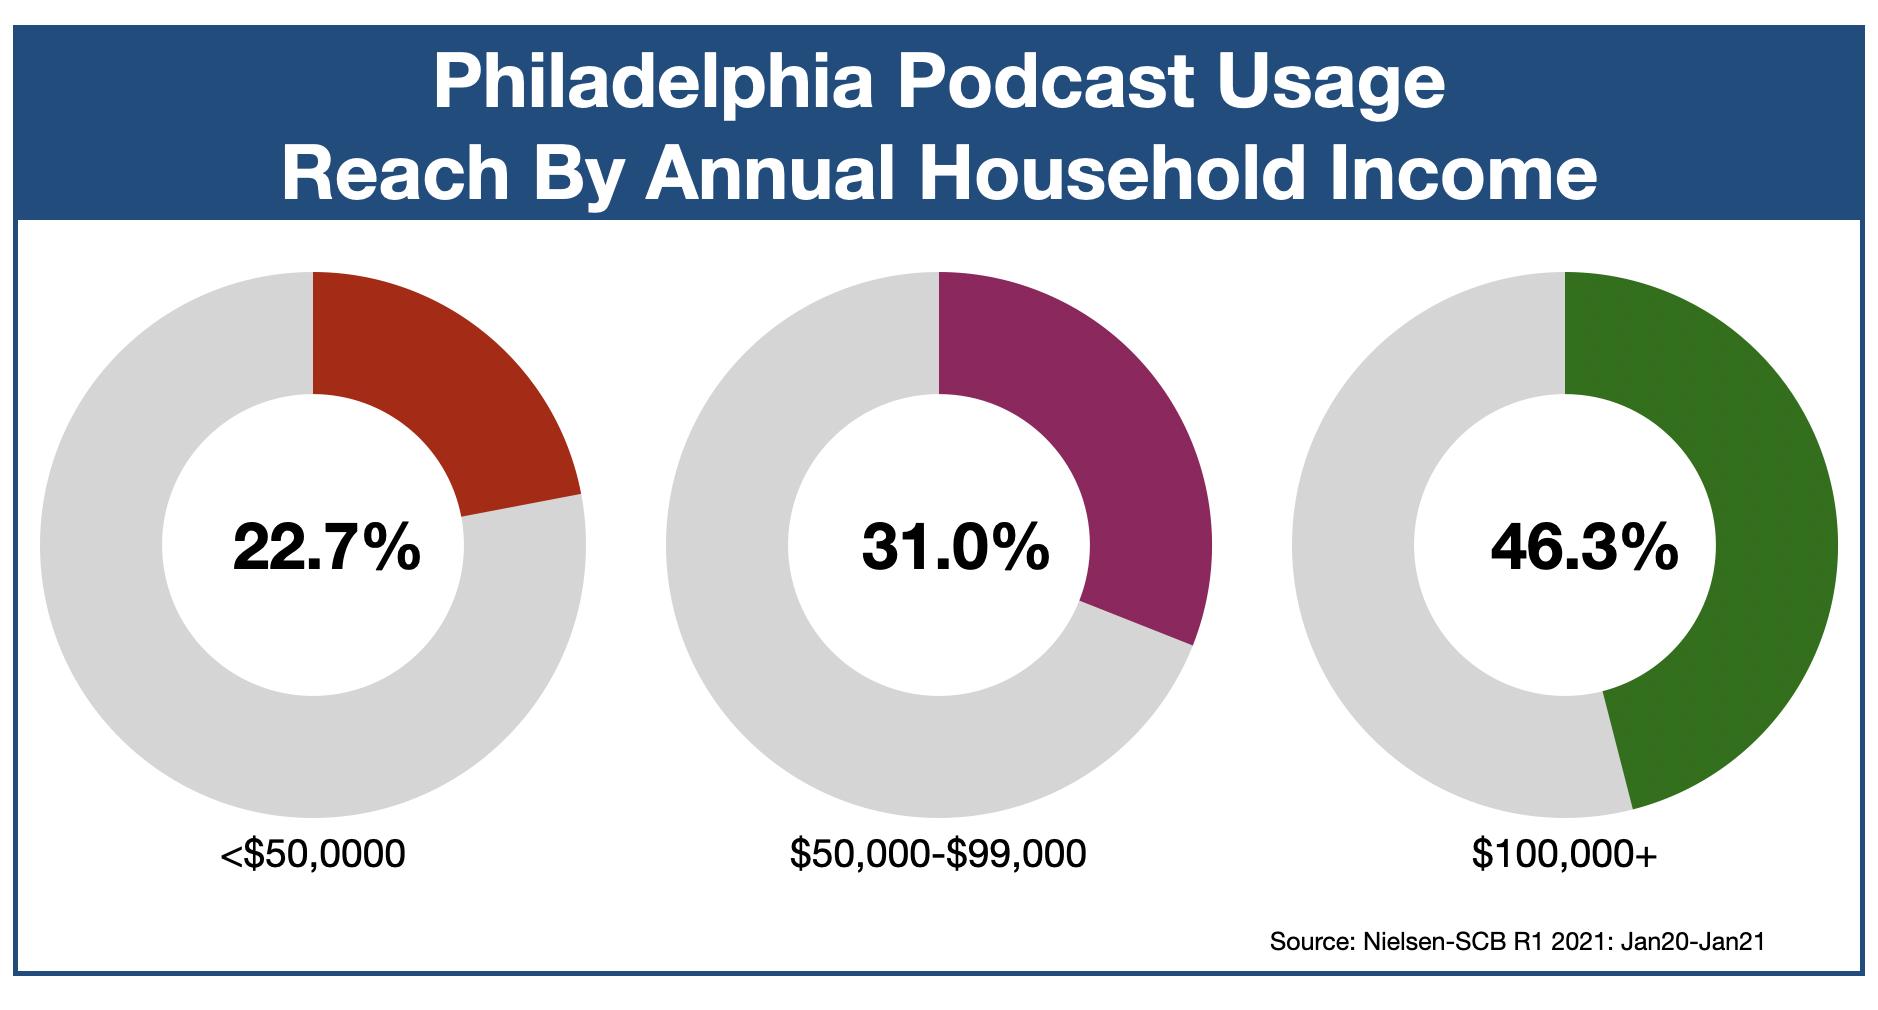 Podcast Advertising In Philadelphia Income